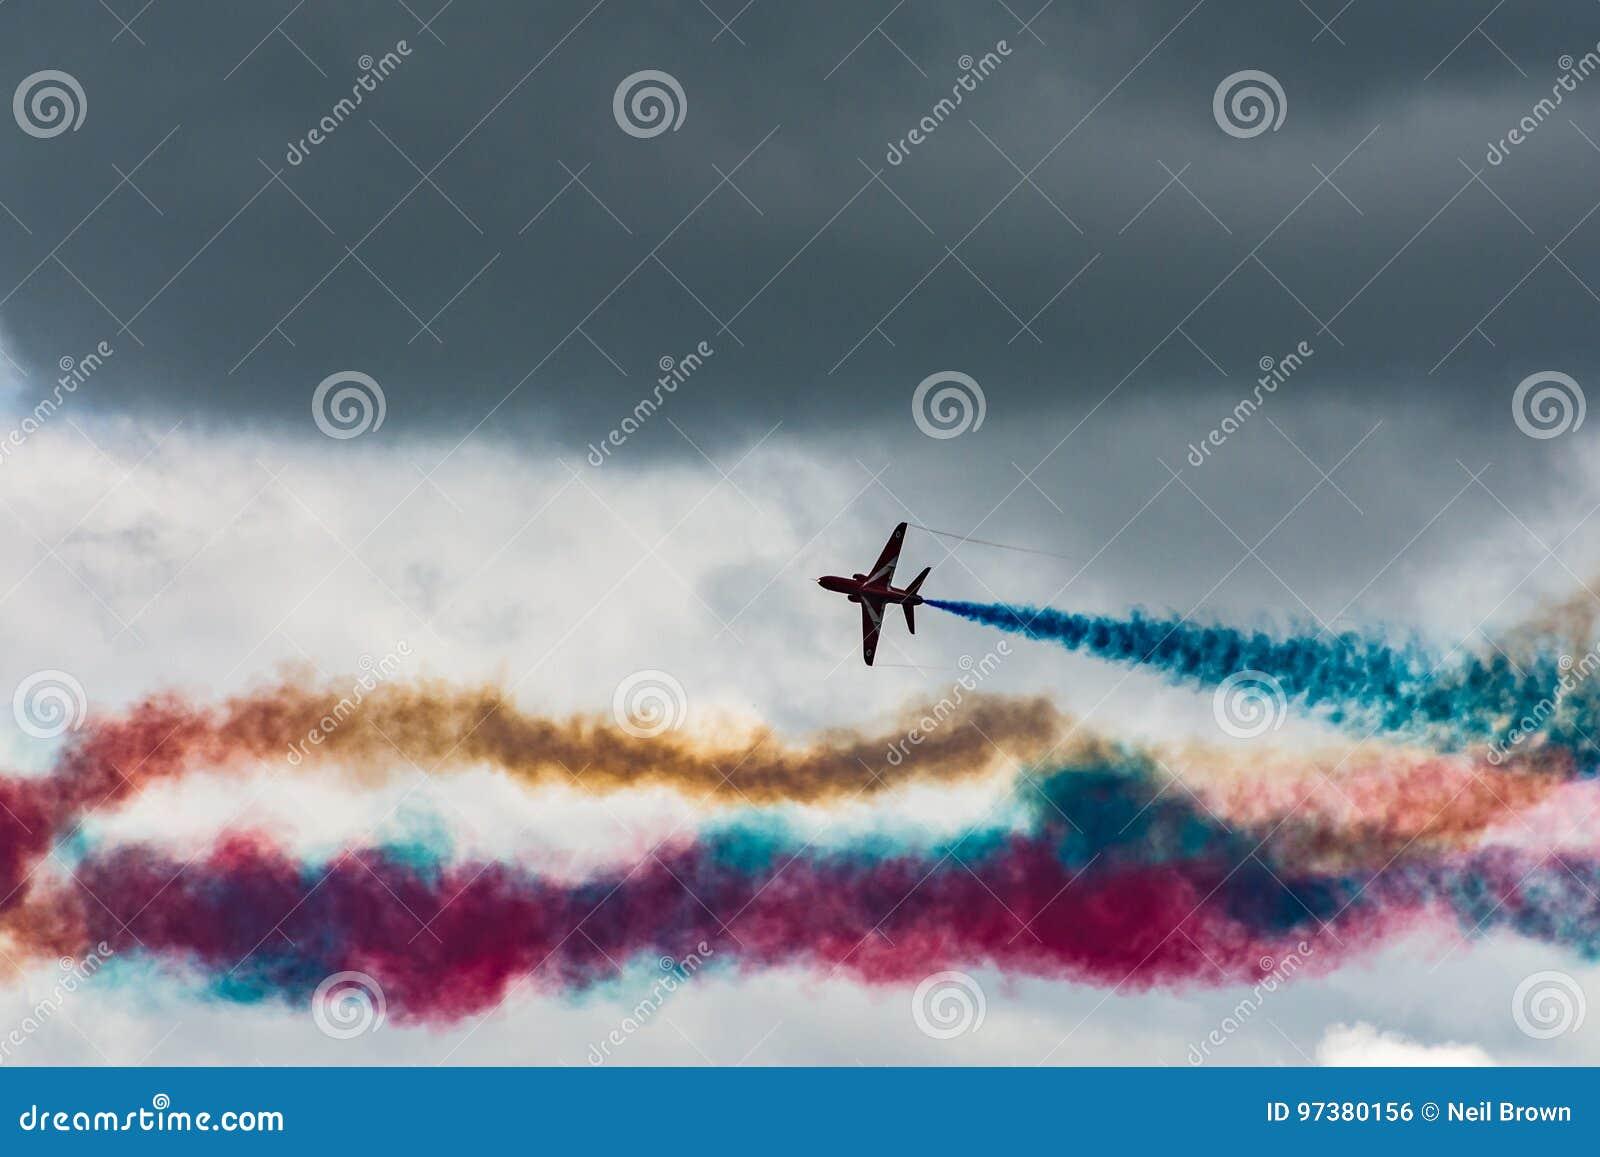 Red parachute stock image. Image of flight, landing, fall